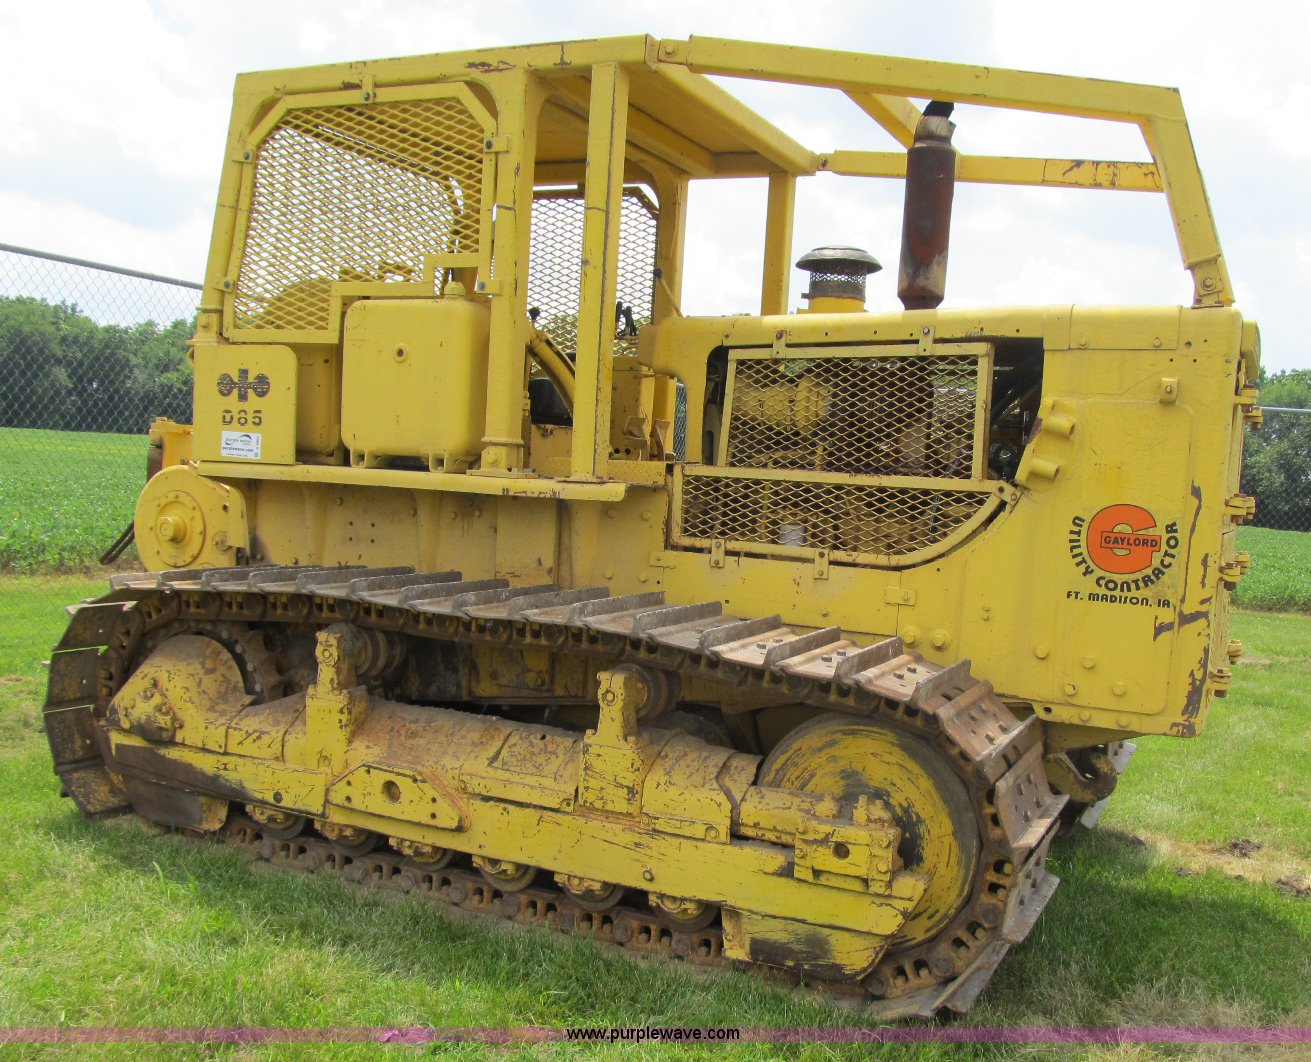 1975 Komatsu D85 dozer | Item A4905 | SOLD! July 28 Construc